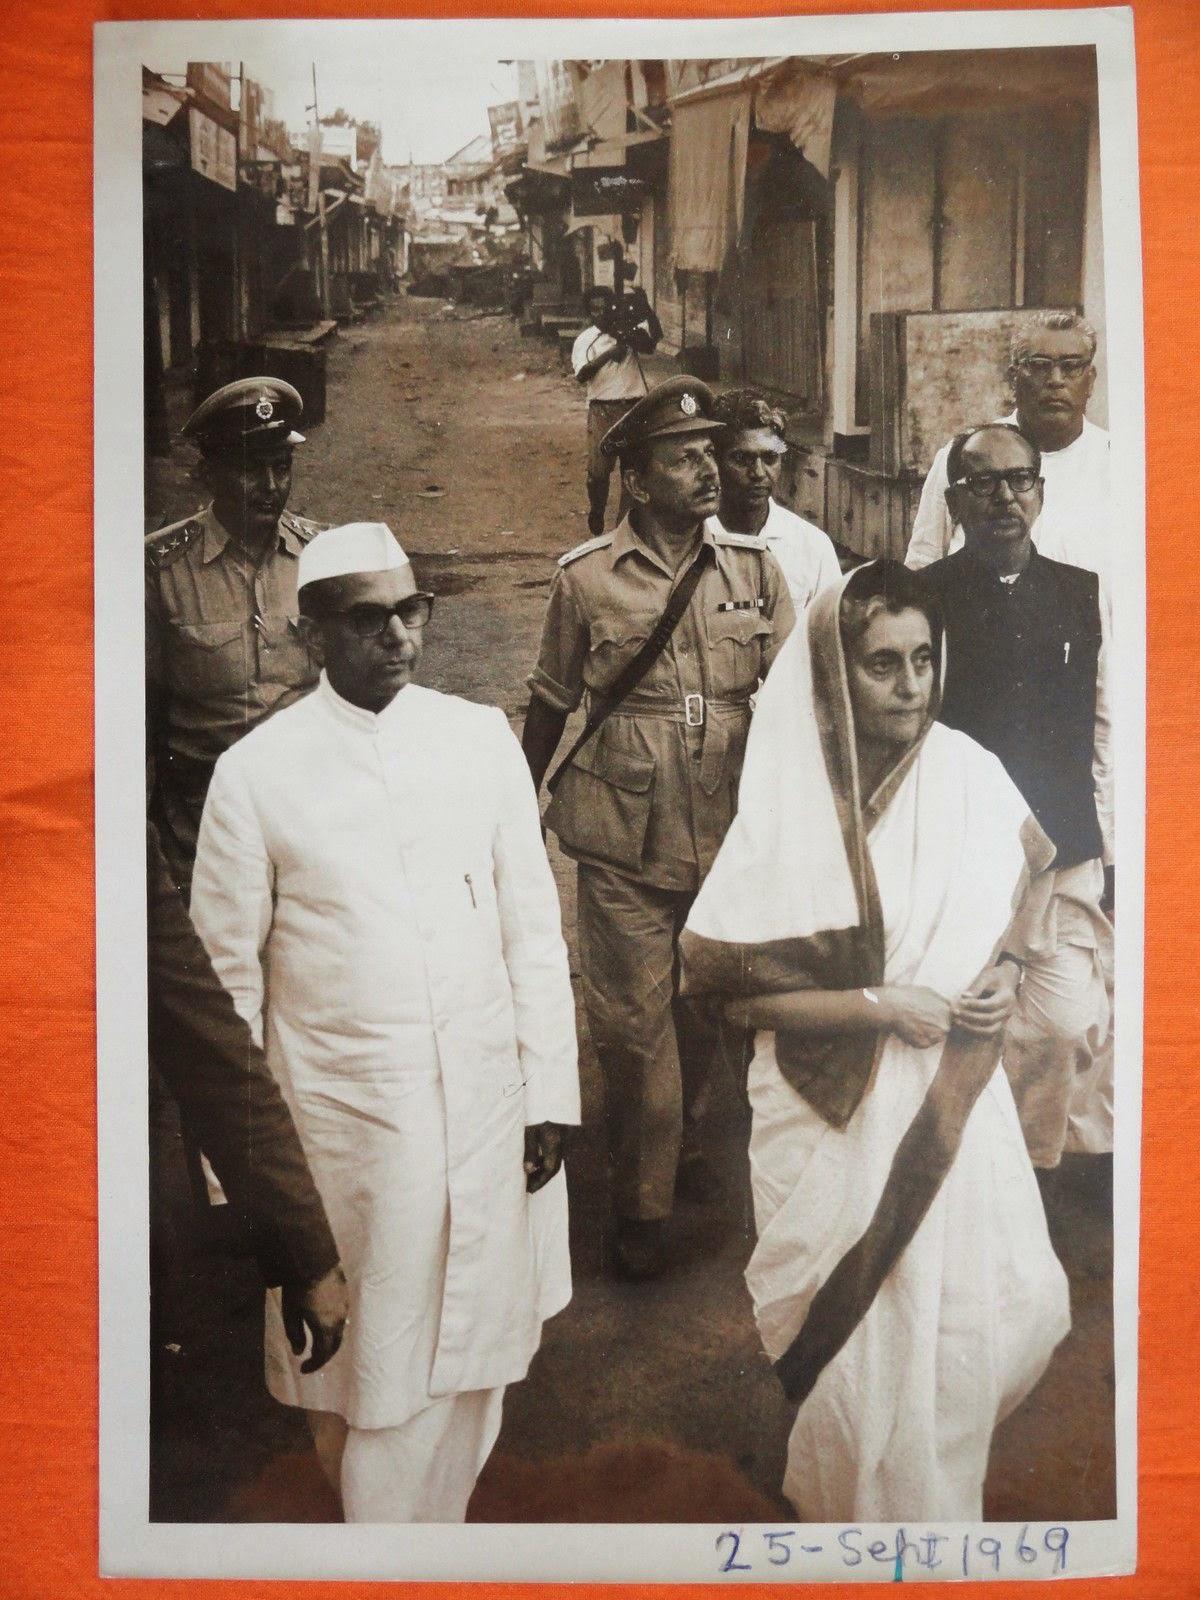 Indian Prime Minister Indira Gandhi Visits Ahmedabad, Gujarat - 1969